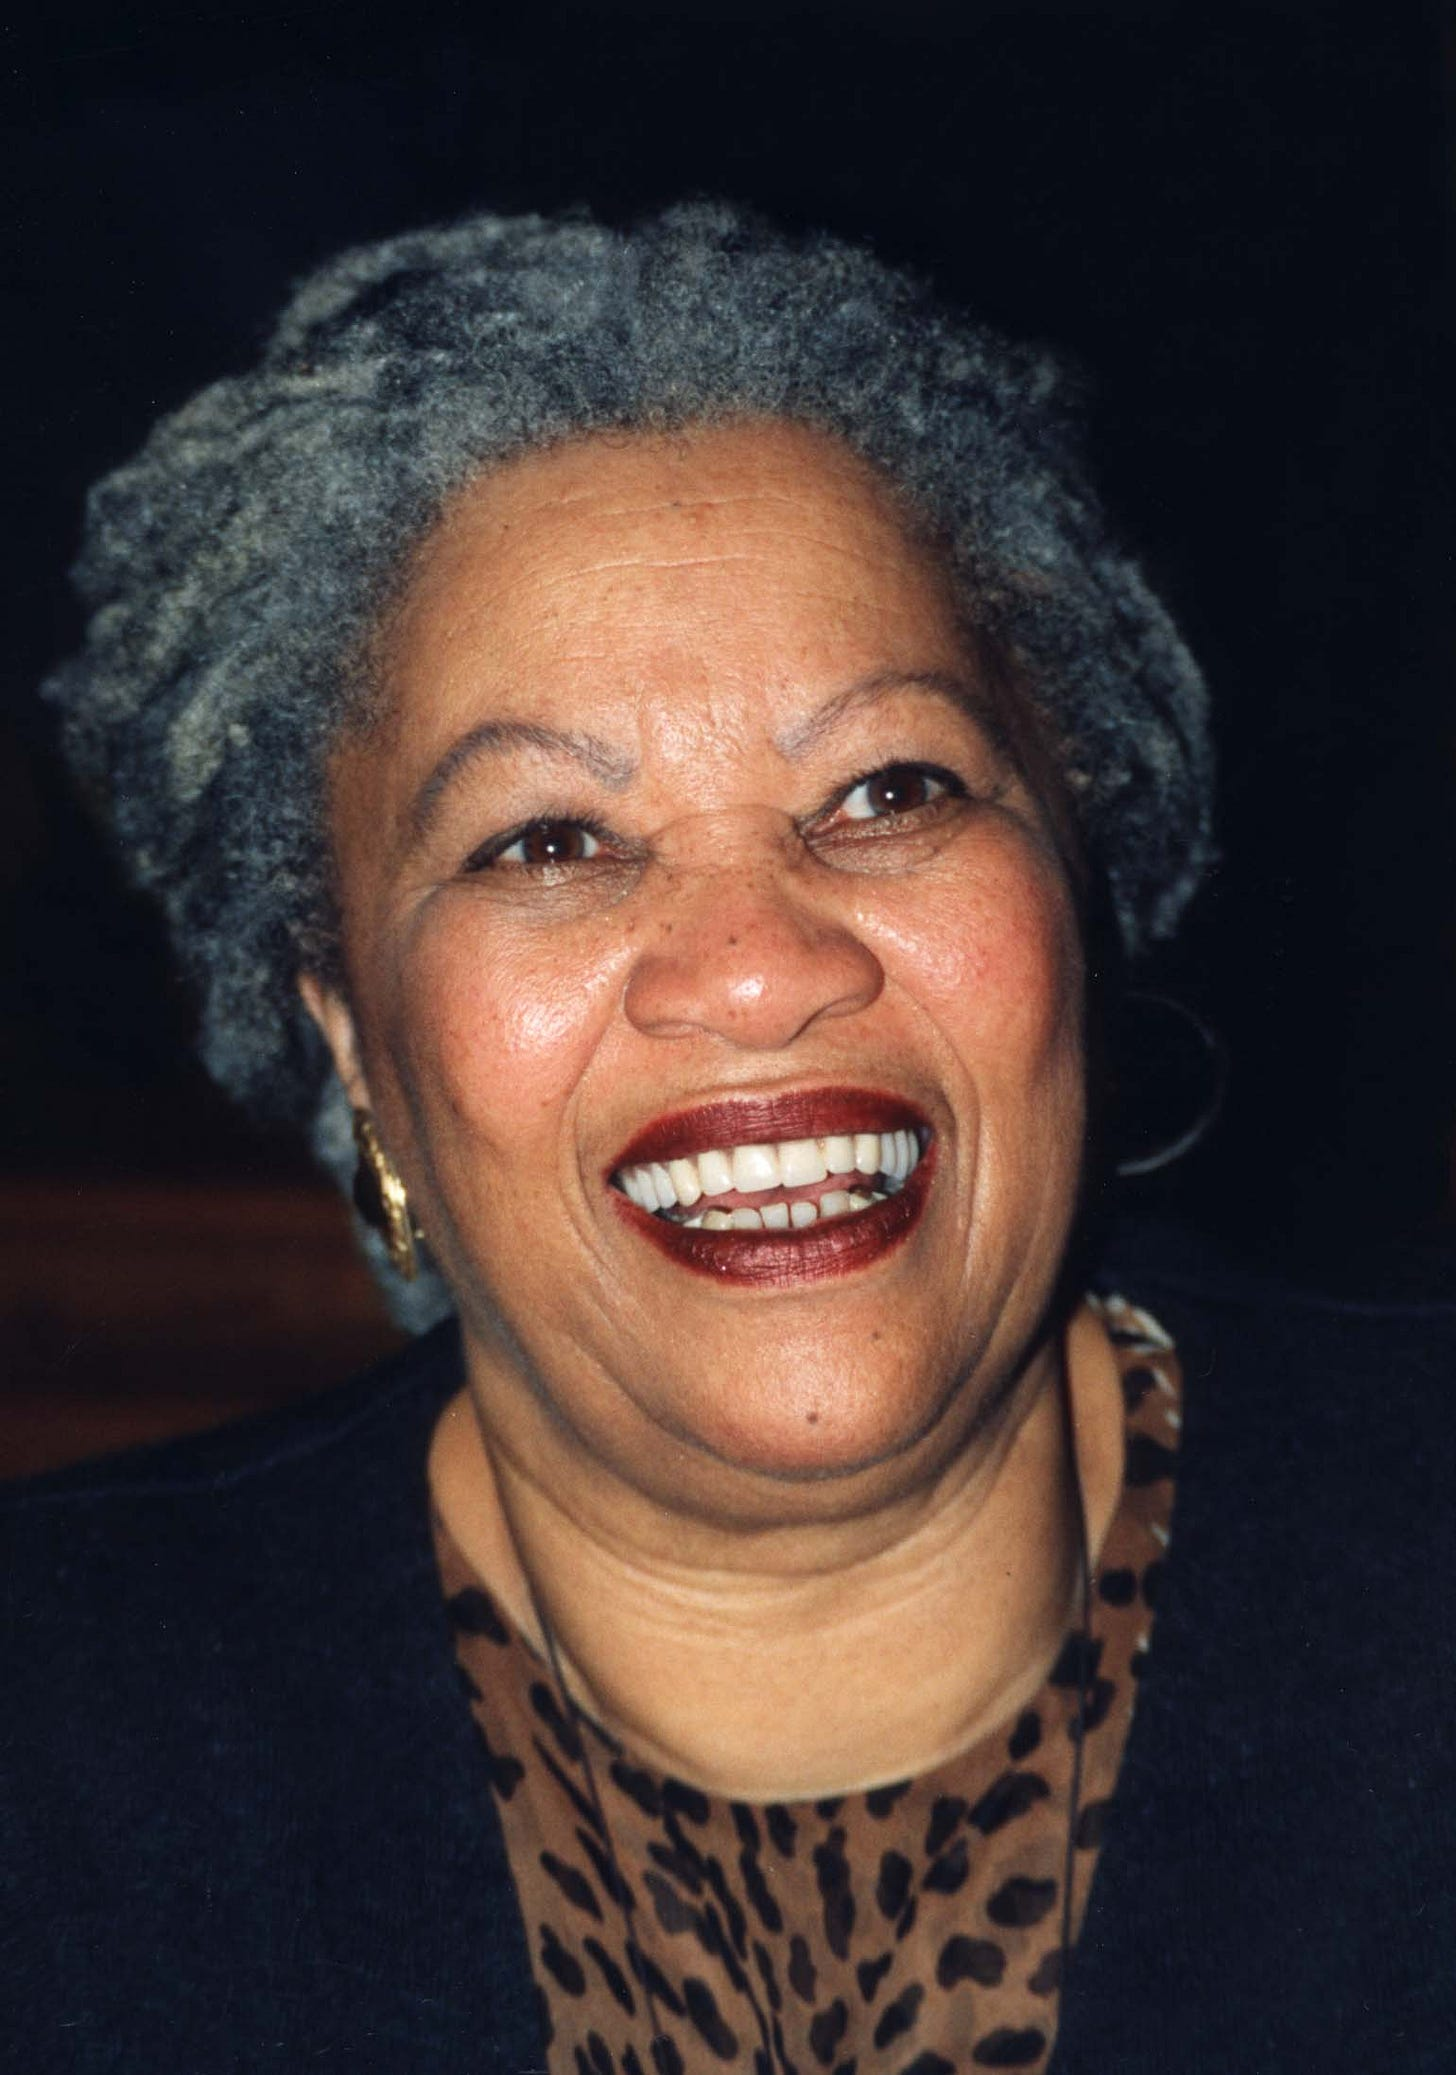 https://upload.wikimedia.org/wikipedia/commons/3/3a/Toni_Morrison.jpg